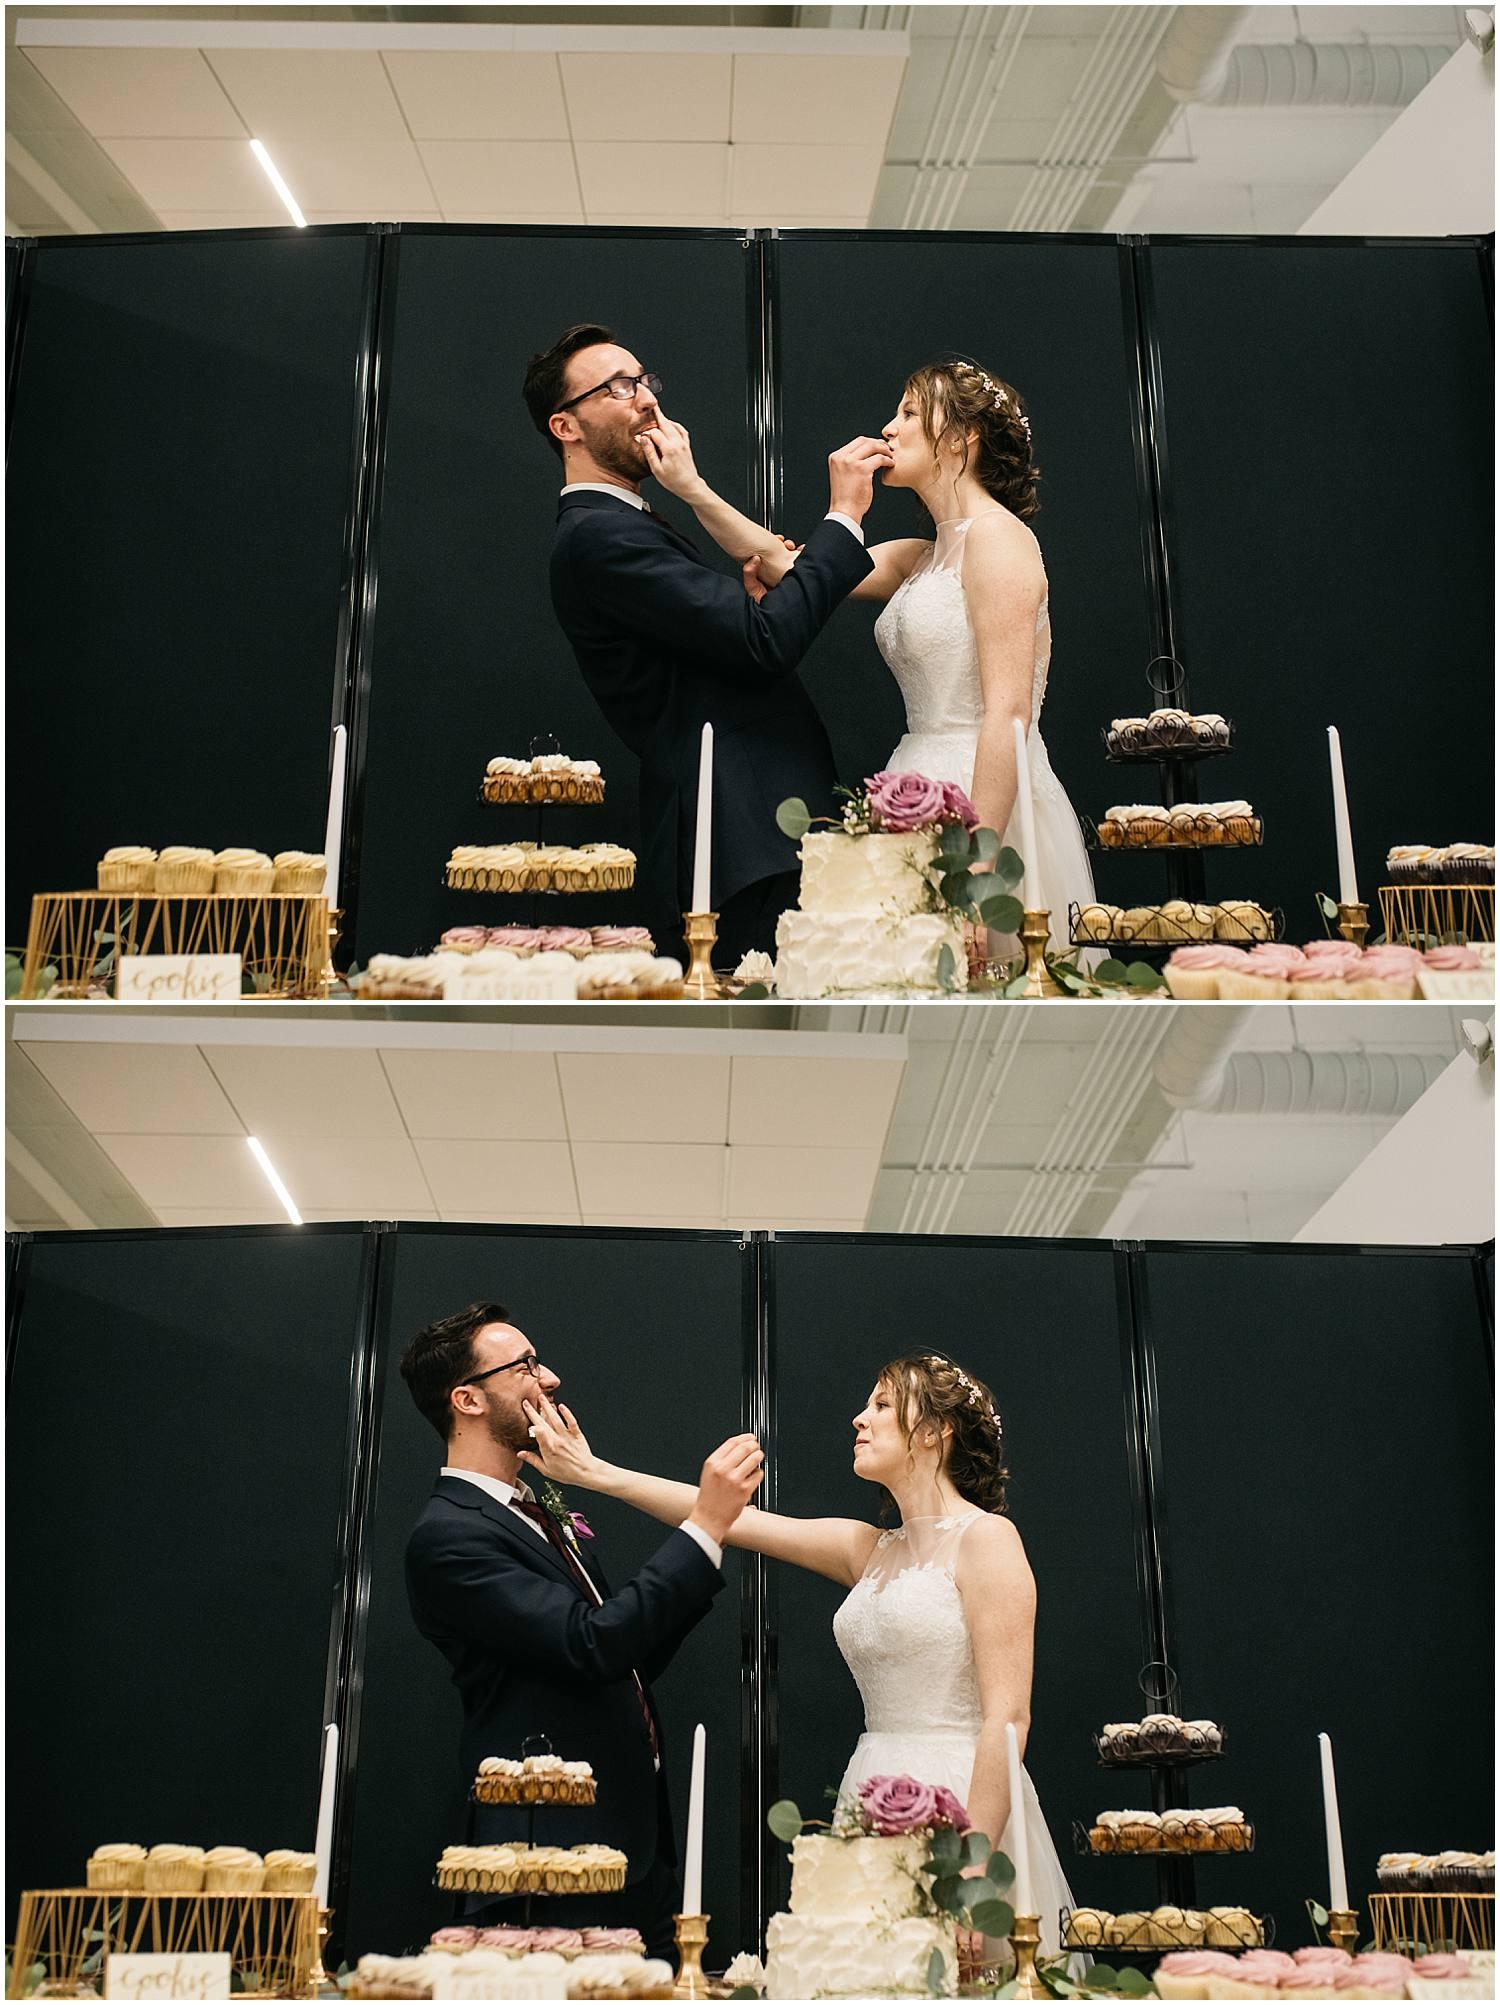 Josh - Emily - wedding - supply manheim- www.gabemcmullen.com138.jpg